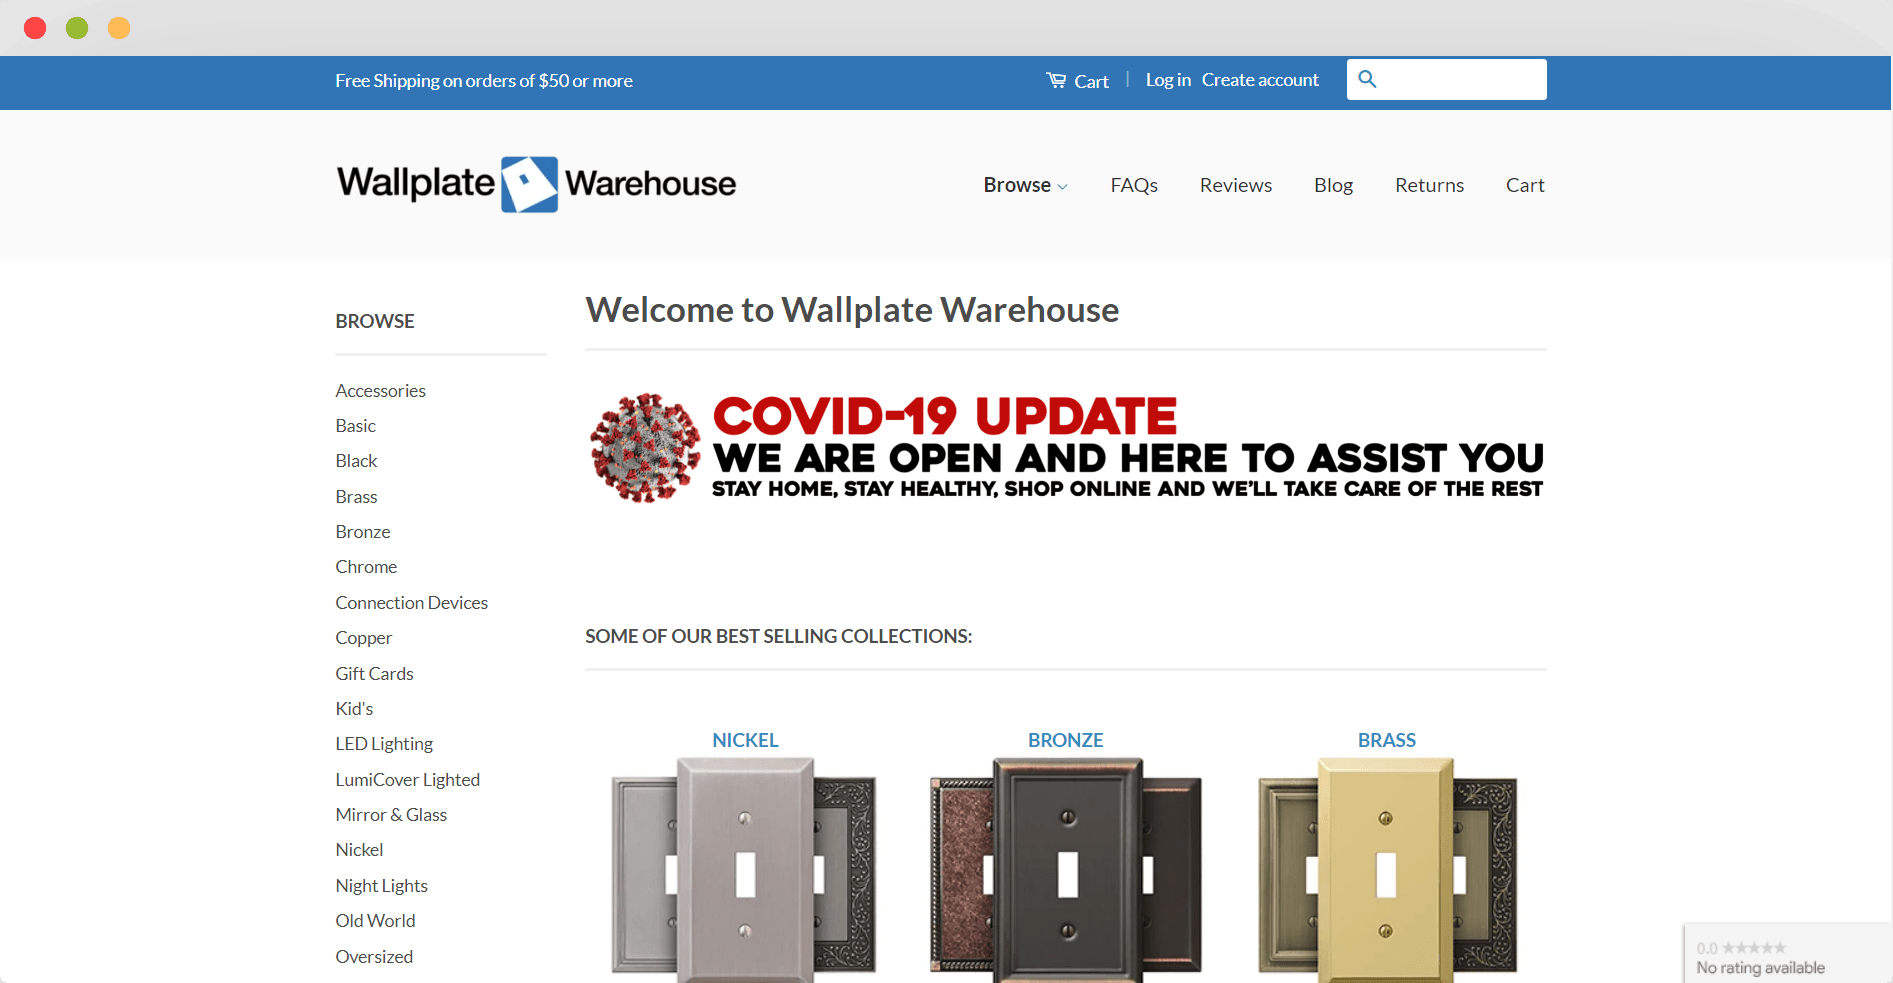 WallPlate Warehouse